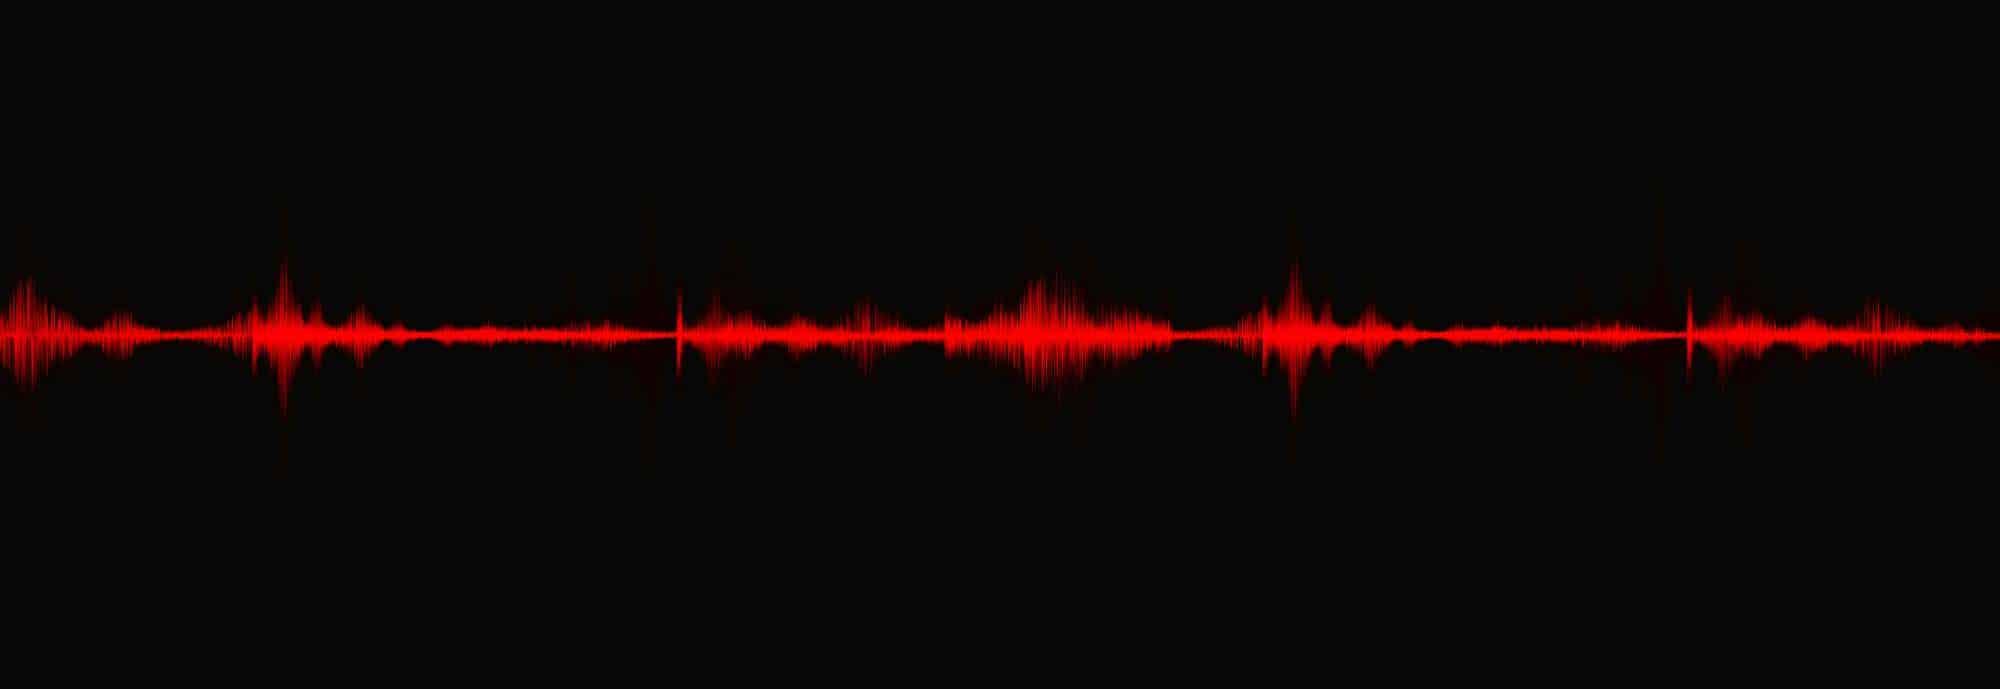 Red Digital Sound Wave